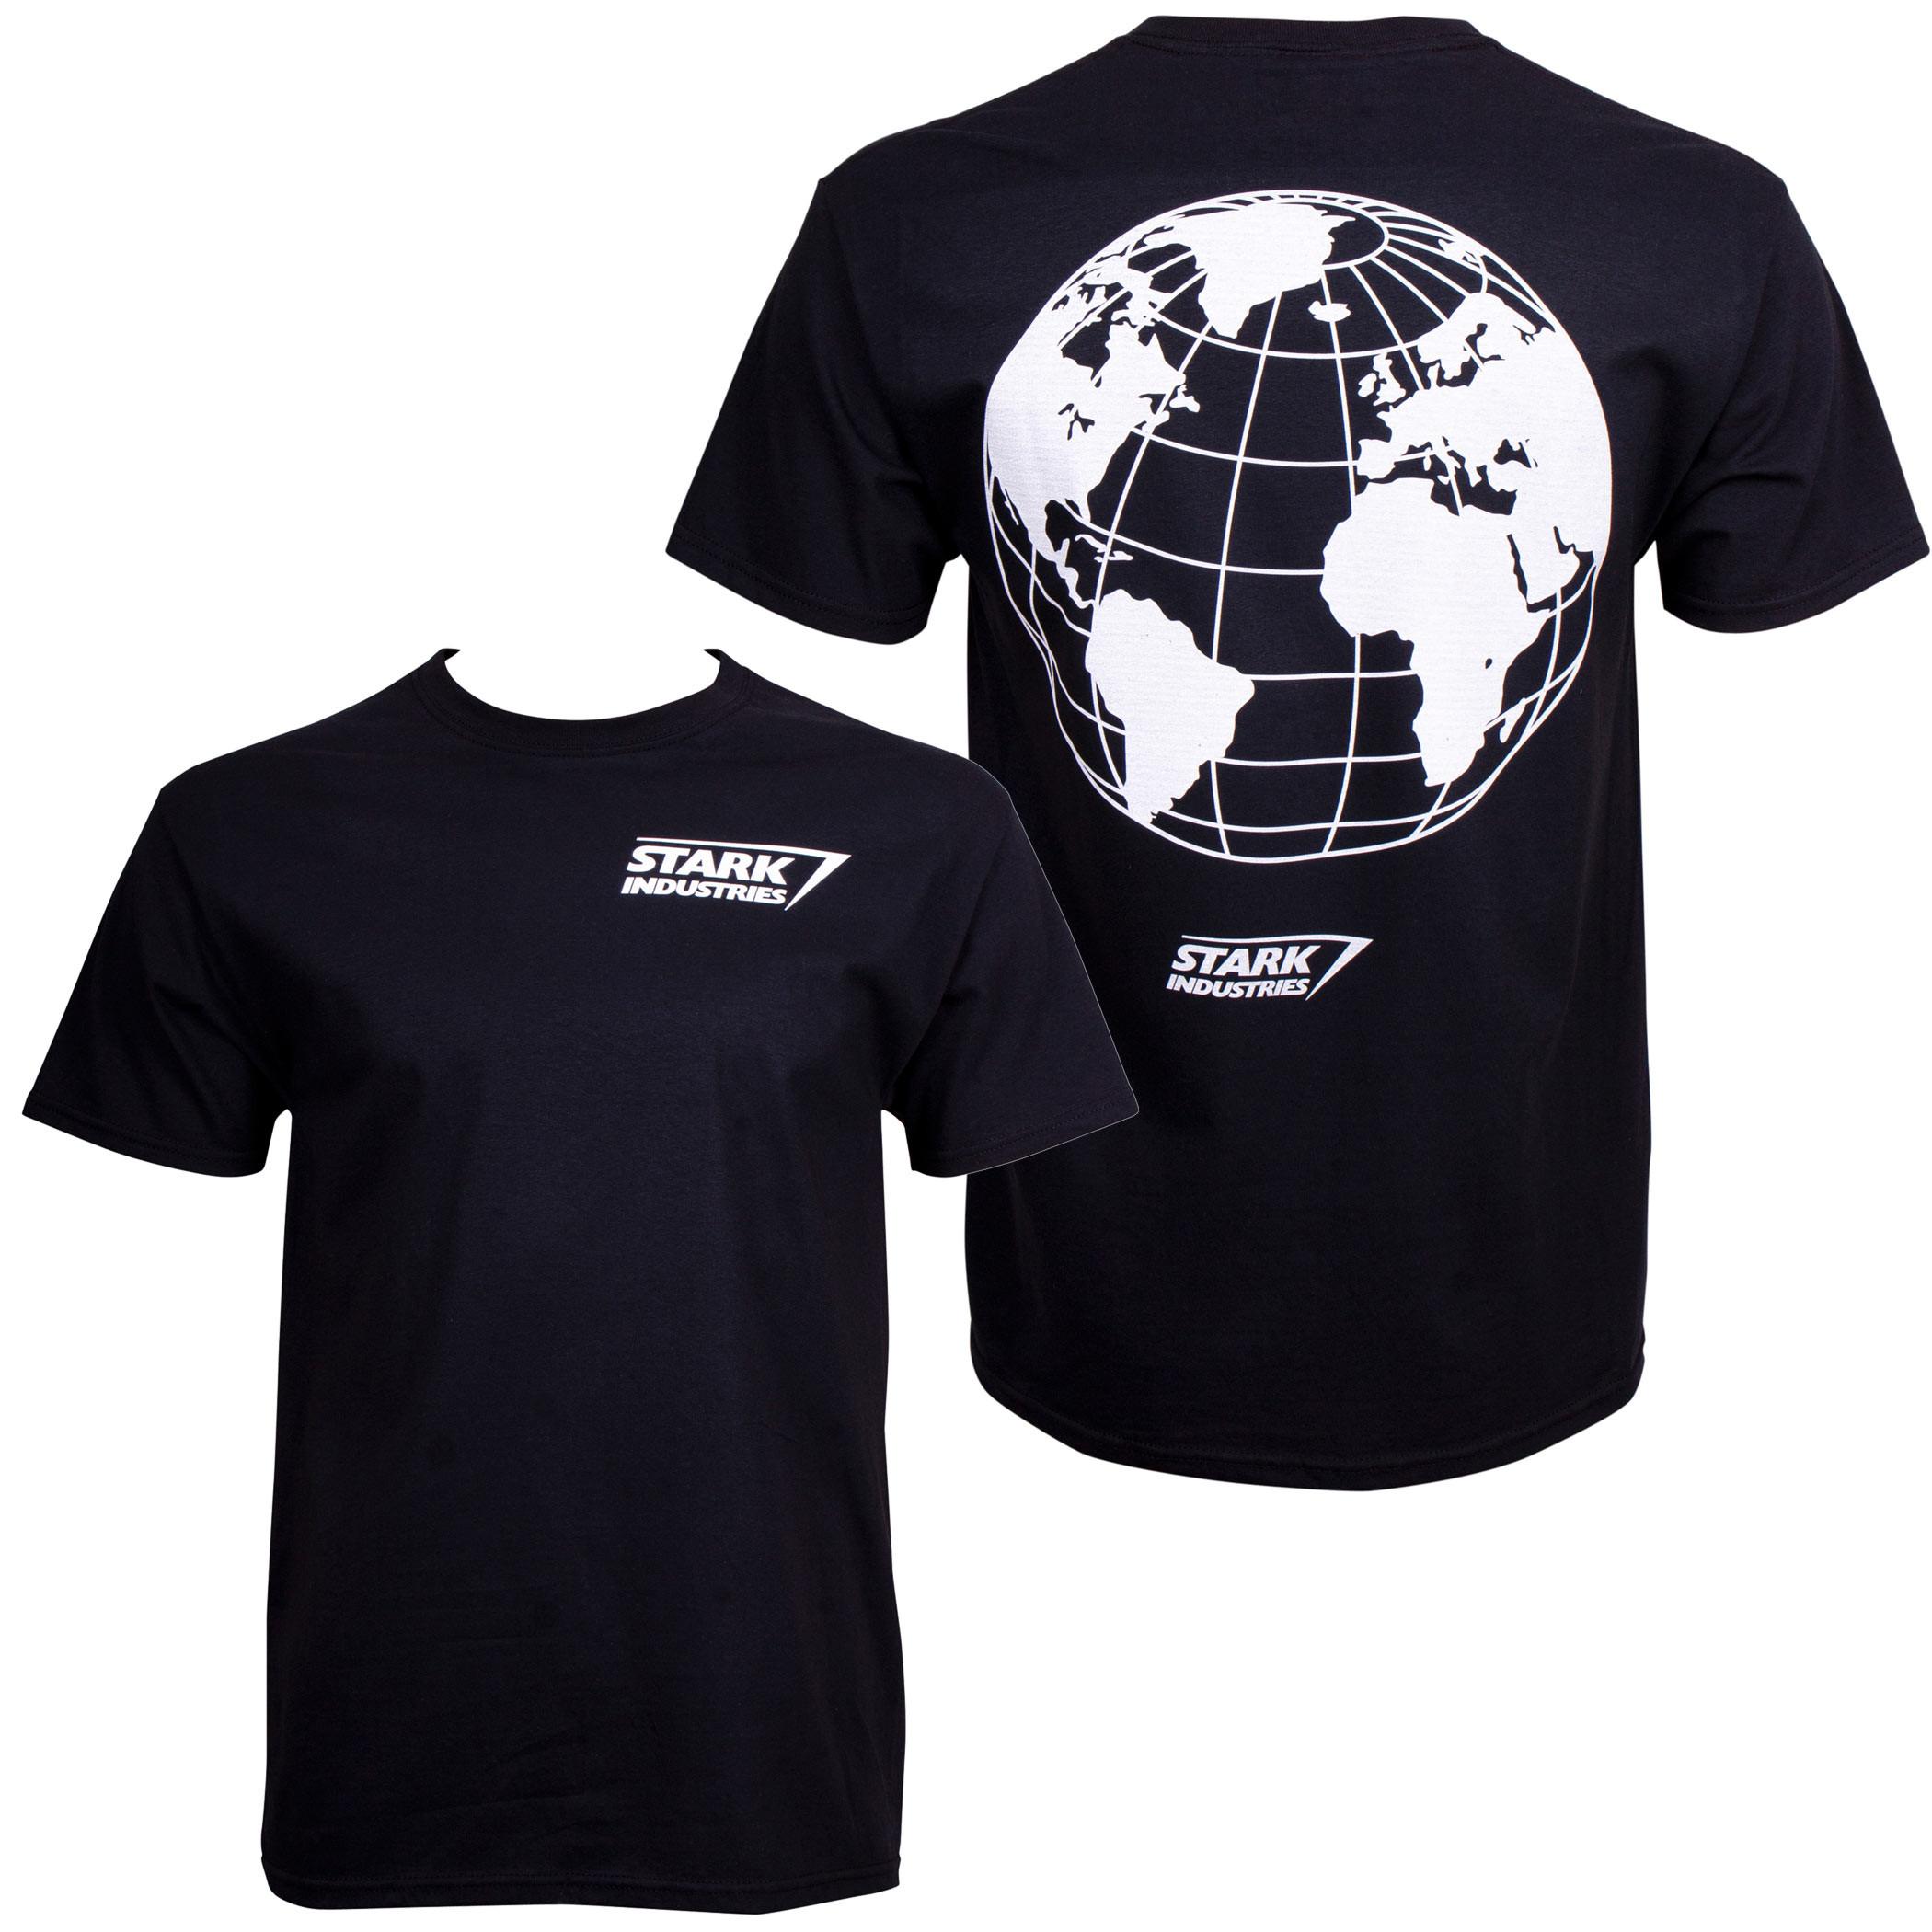 Iron Man Stark Industries World Back Print T-Shirt